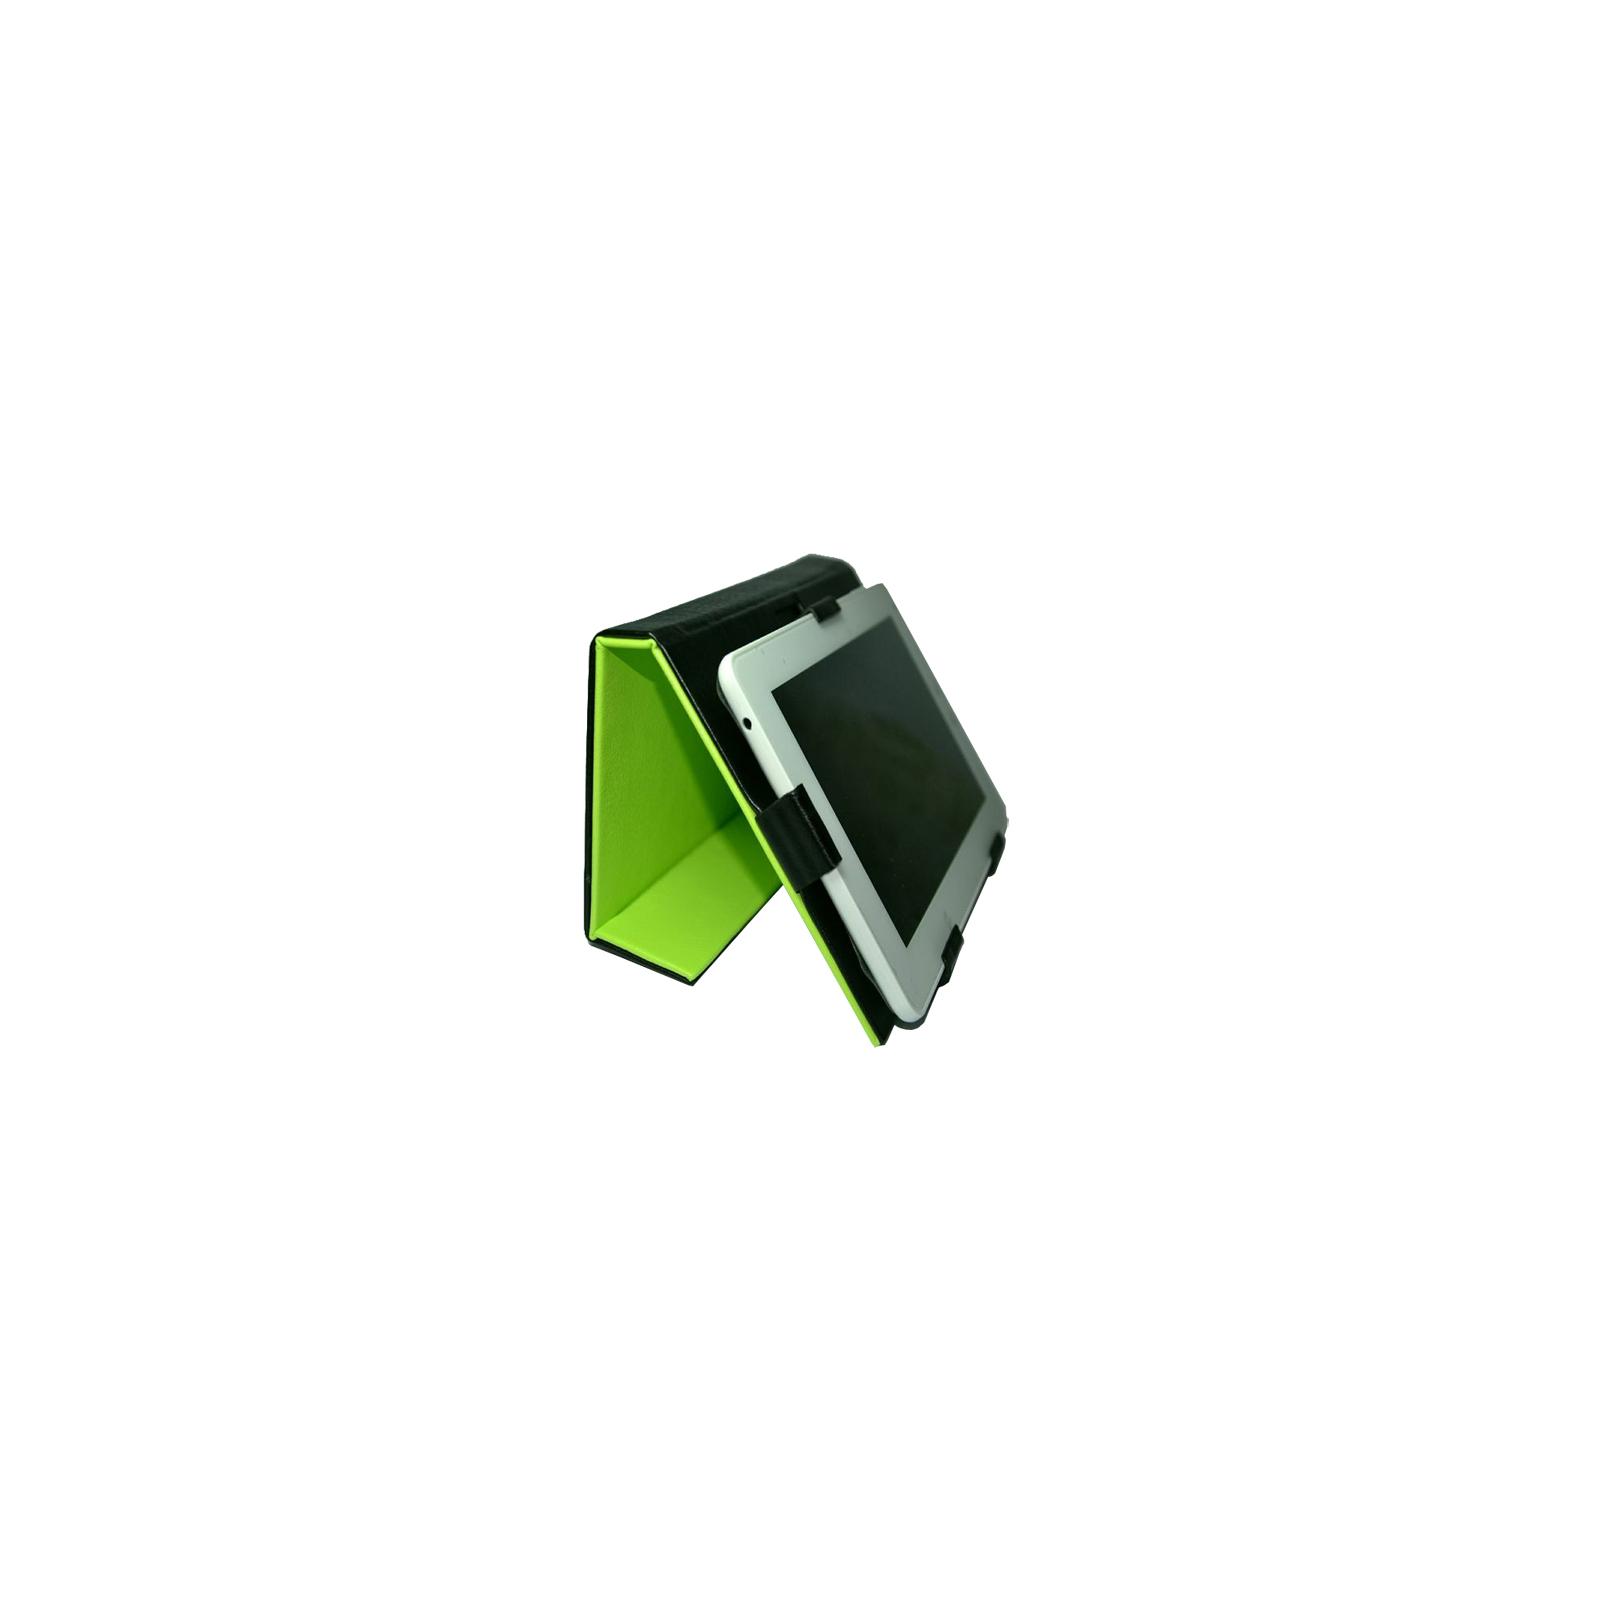 Чехол для планшета Vento 7 Desire Bright - lime изображение 3